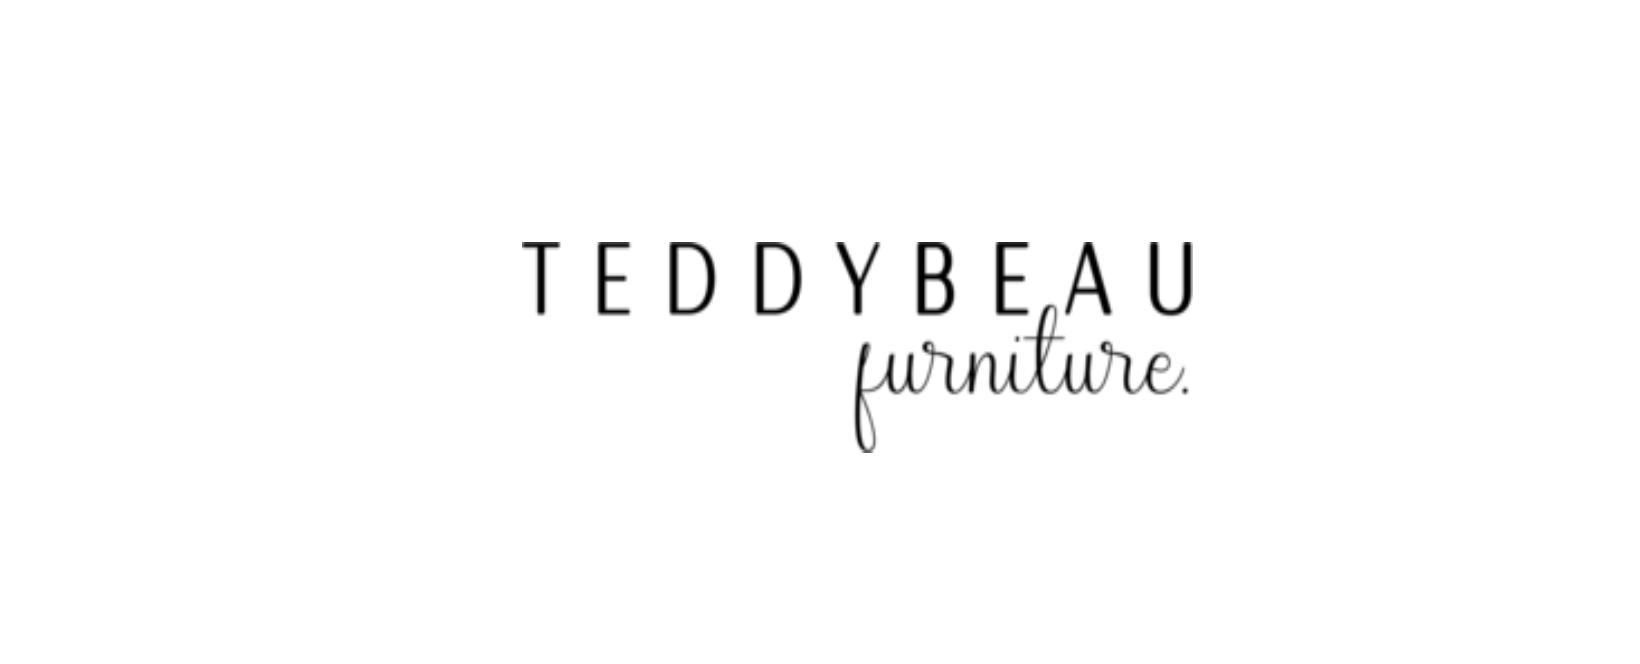 Teddy Beau UK Discount Code 2021